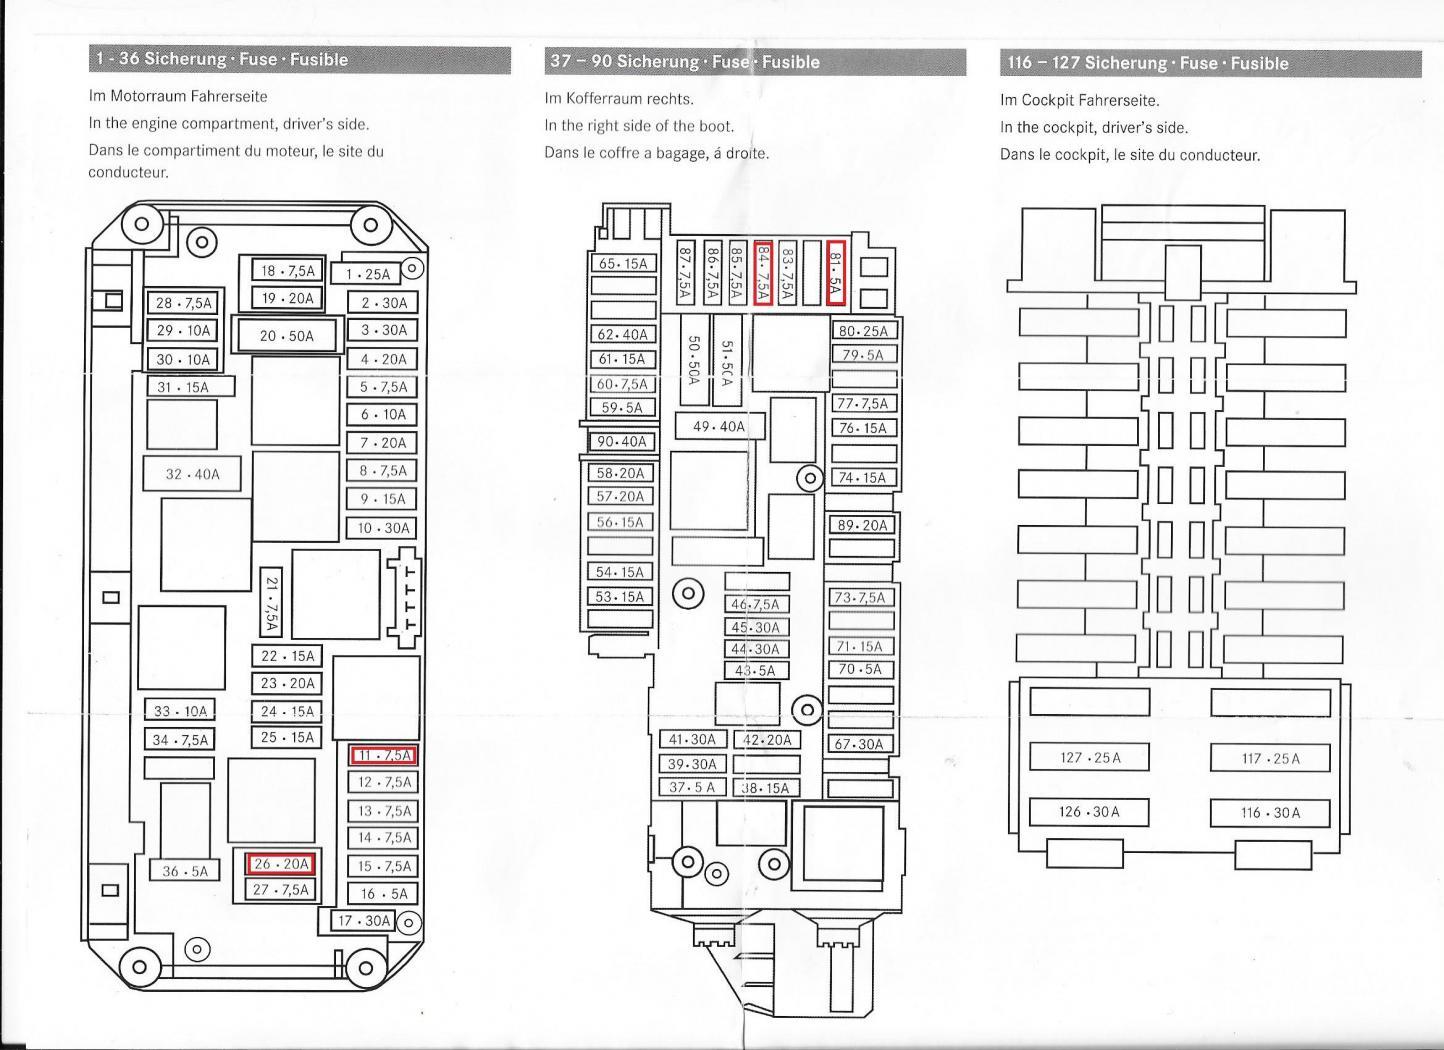 Ecran Autoradio Navigation Eteint Commandes Inoperantes